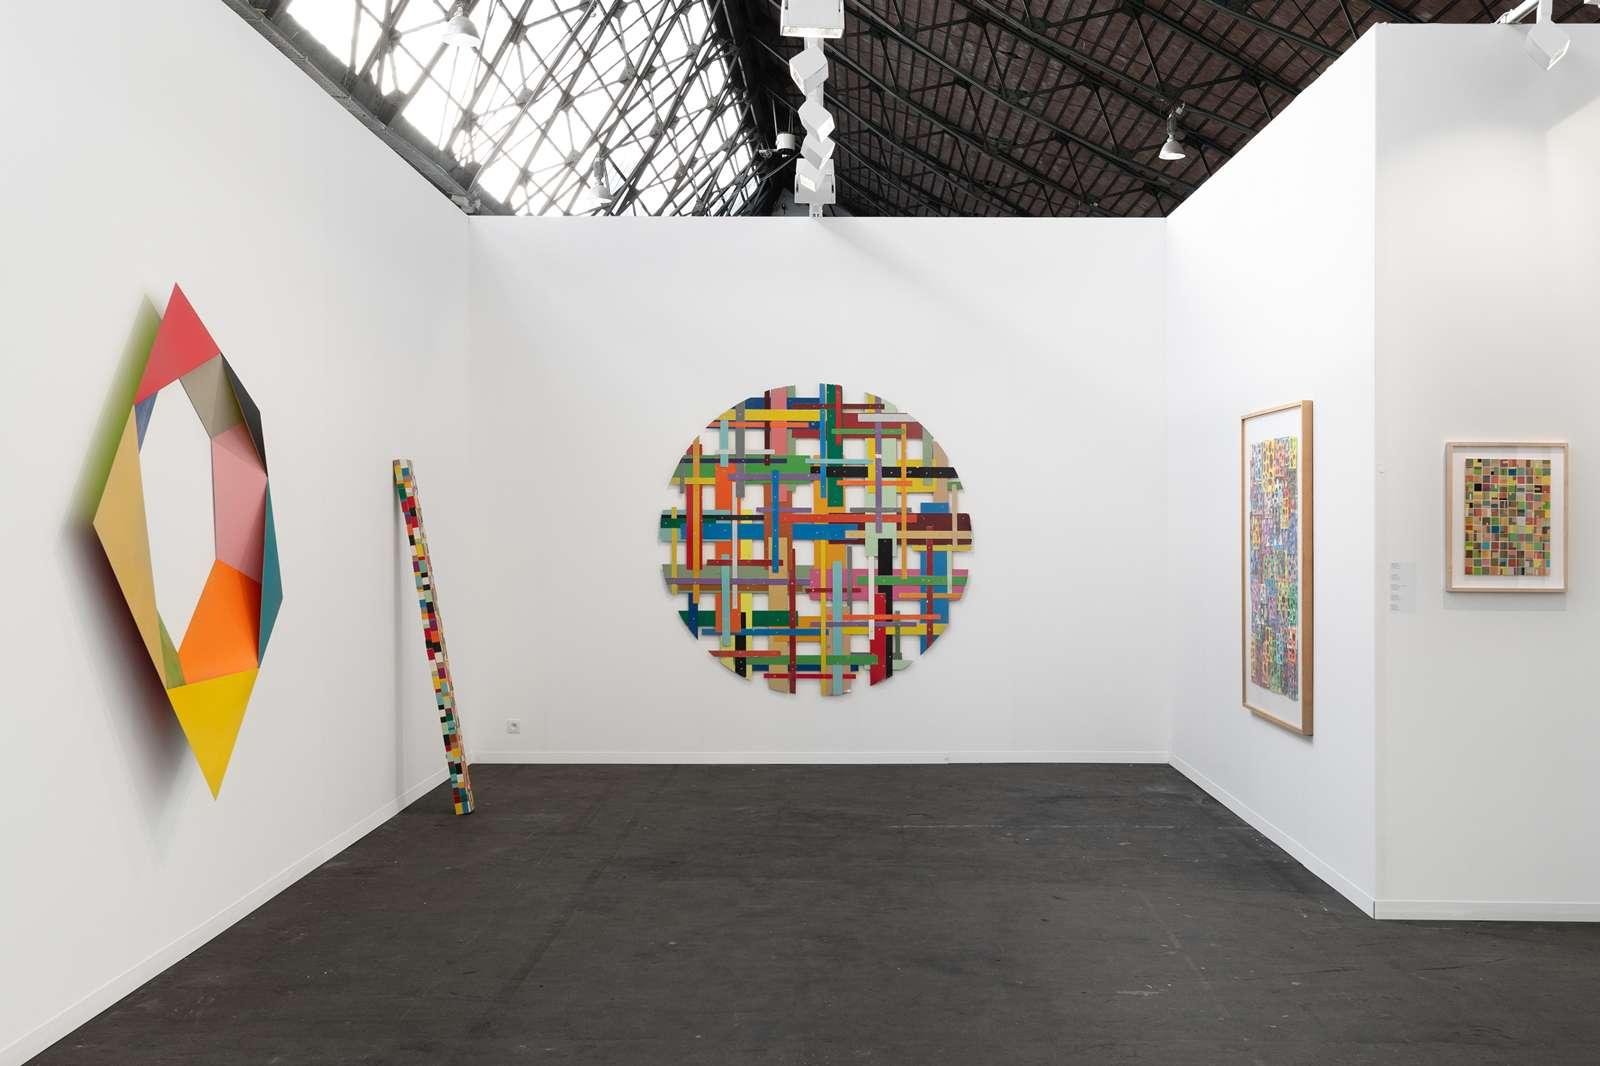 William S. Burroughs, Oli Epp, Françoise Pétrovitch, Présence Panchounette & Beat Zoderer Art Brussels, Brussels (BE) Semiose 19 — 22 avril 2018